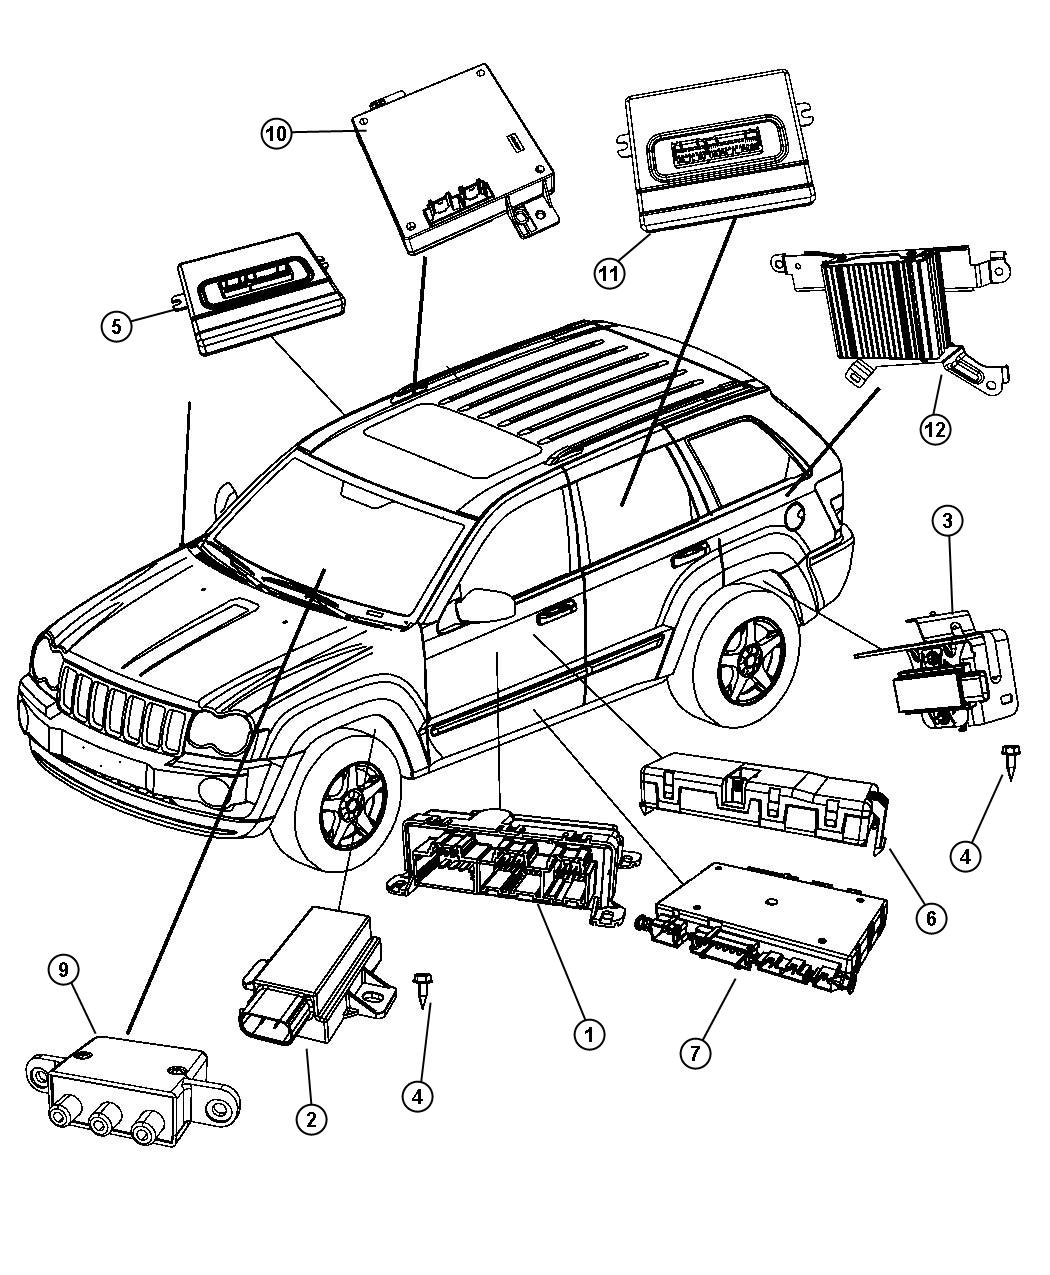 Jeep Commander Module. Power inverter. With bracket